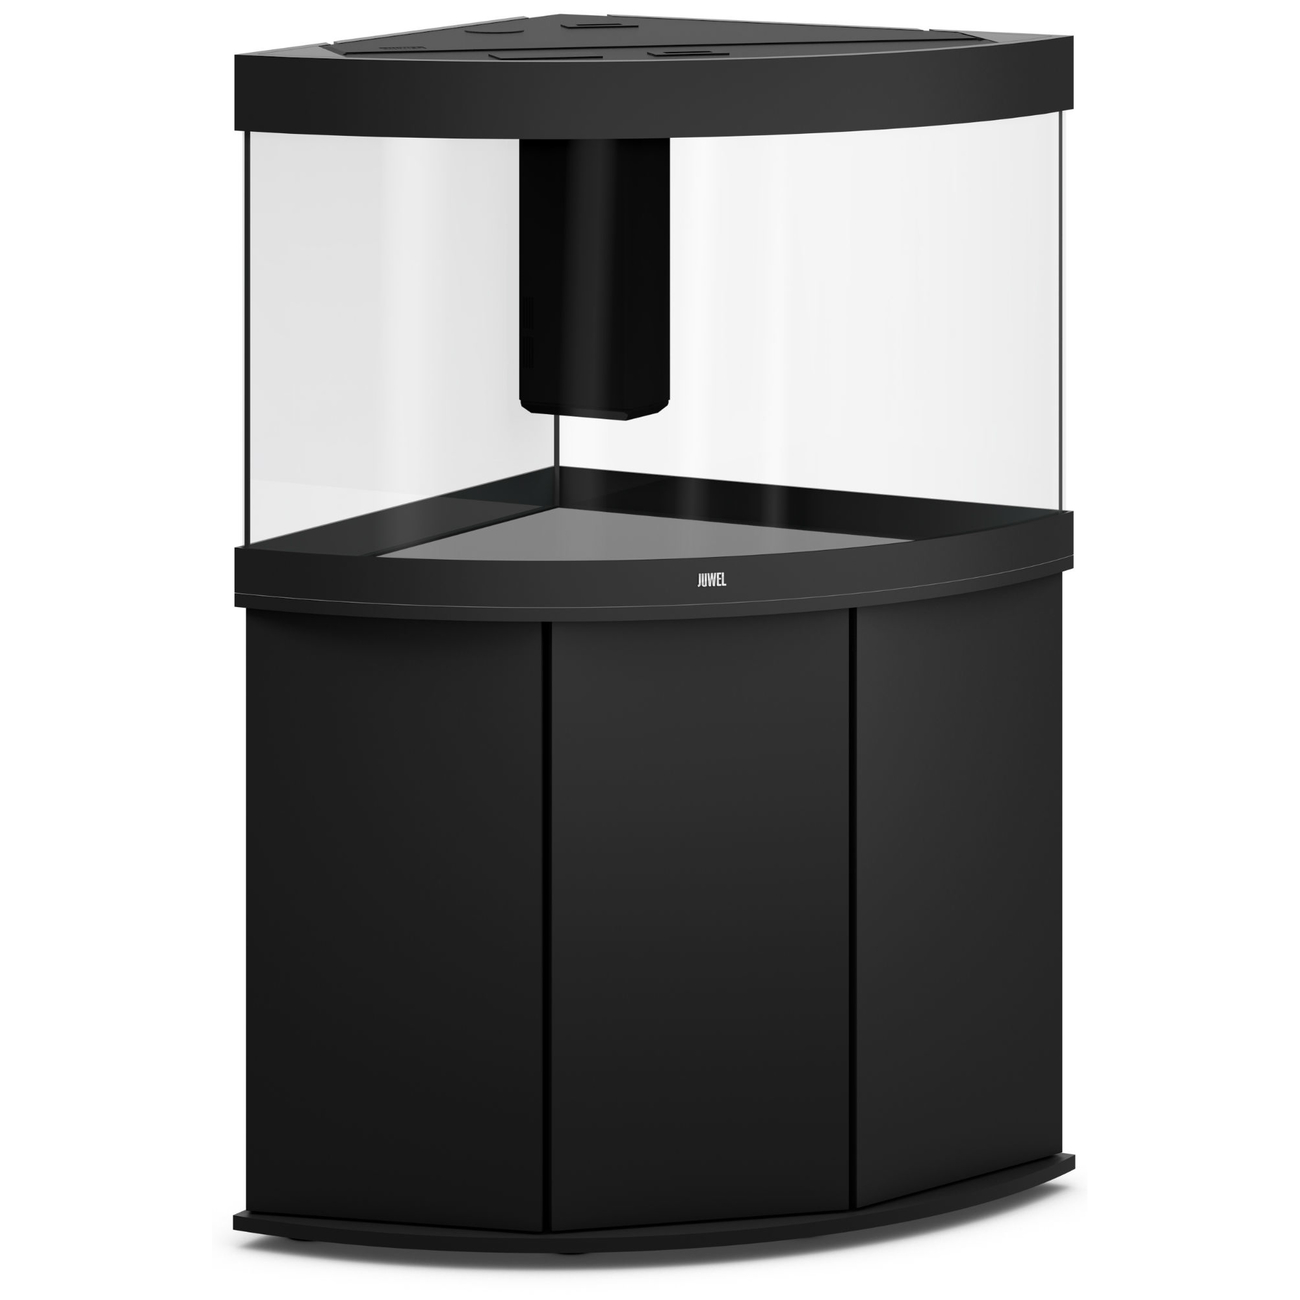 Juwel Trigon 190 LED Eck-Aquarium mit Unterschrank, Bild 3